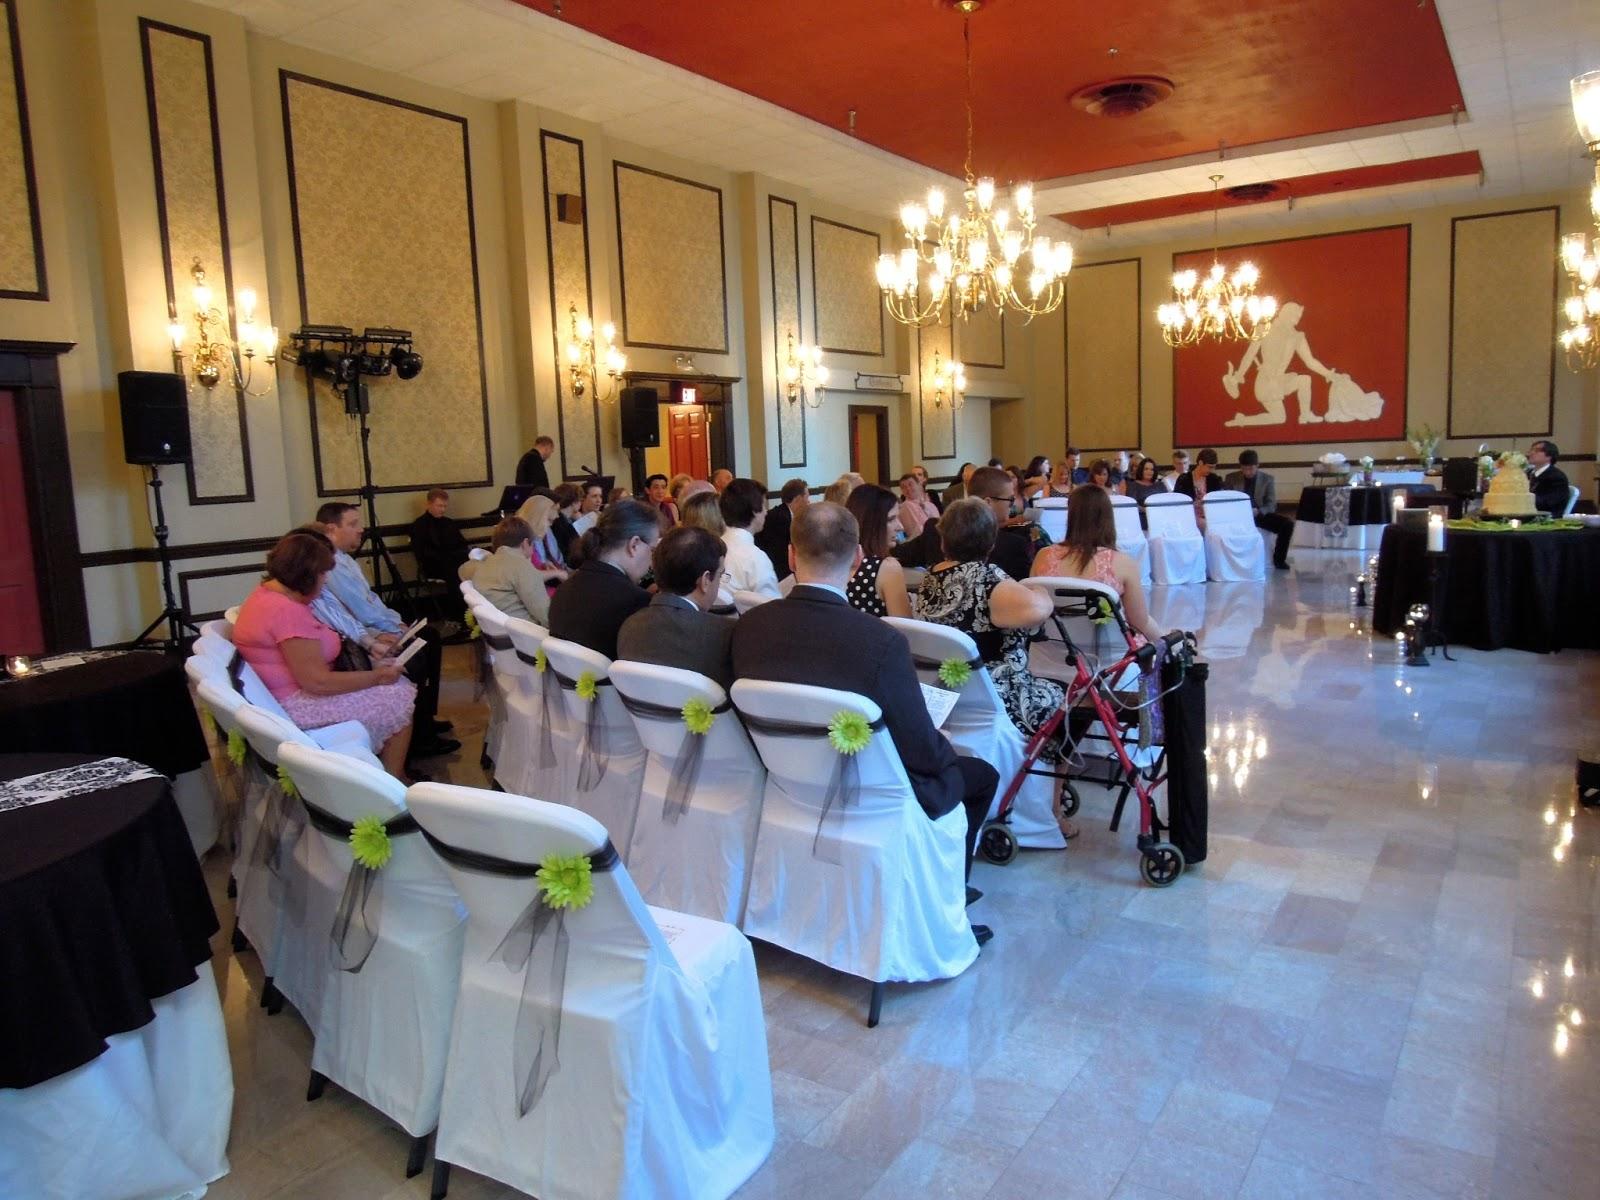 raleigh wedding blog july 2013